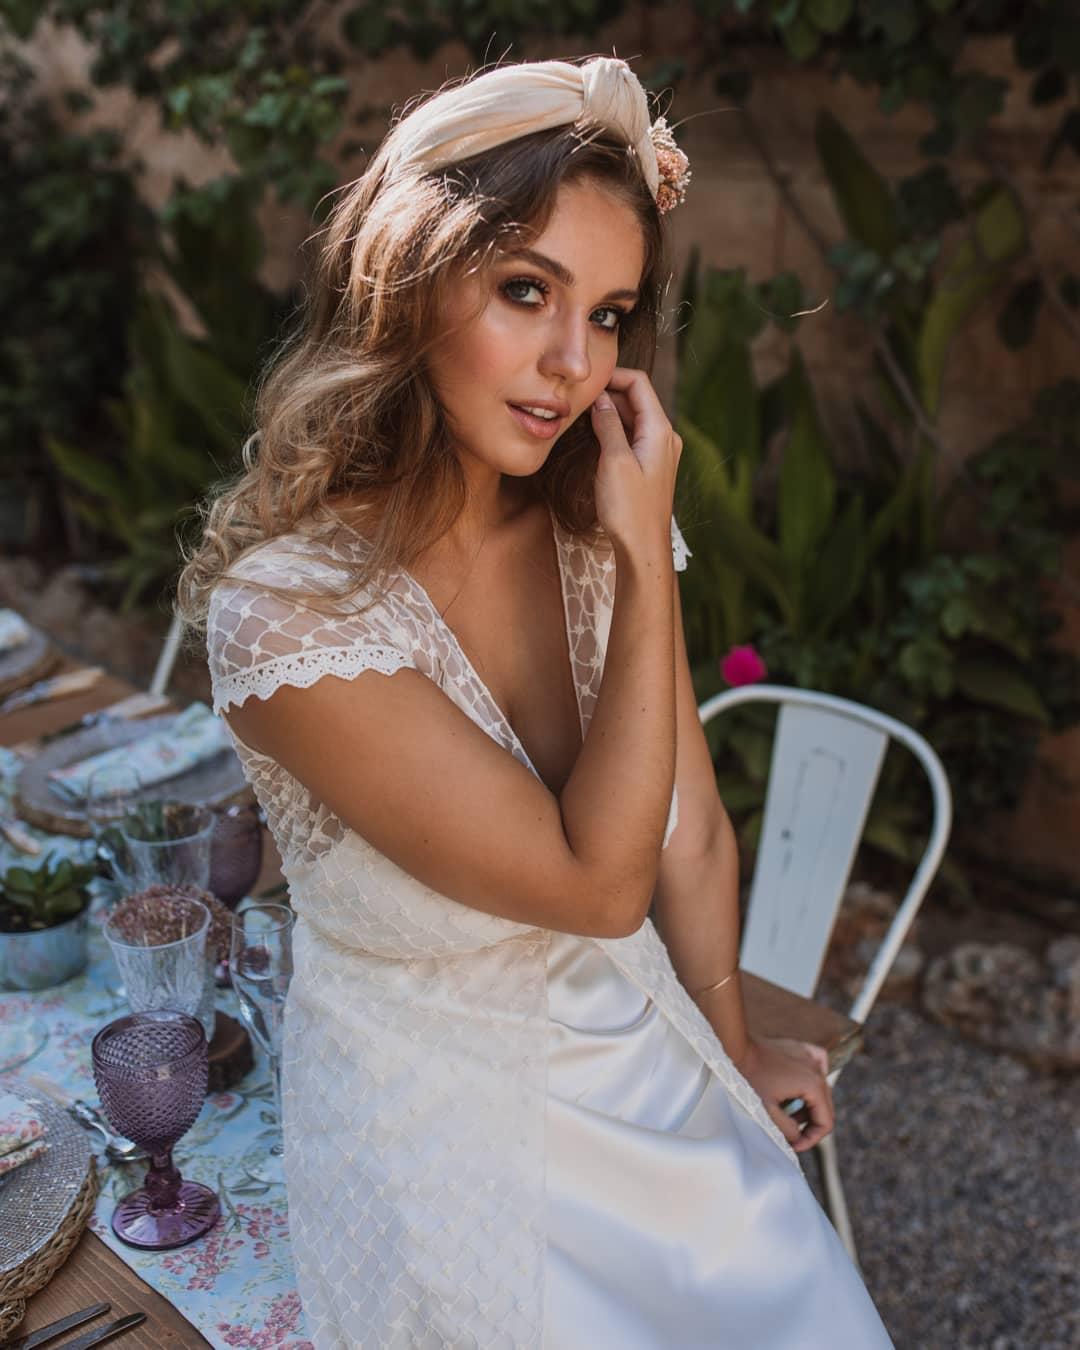 claudia cruz garcia gonzalez, miss international spain 2019. 70815811